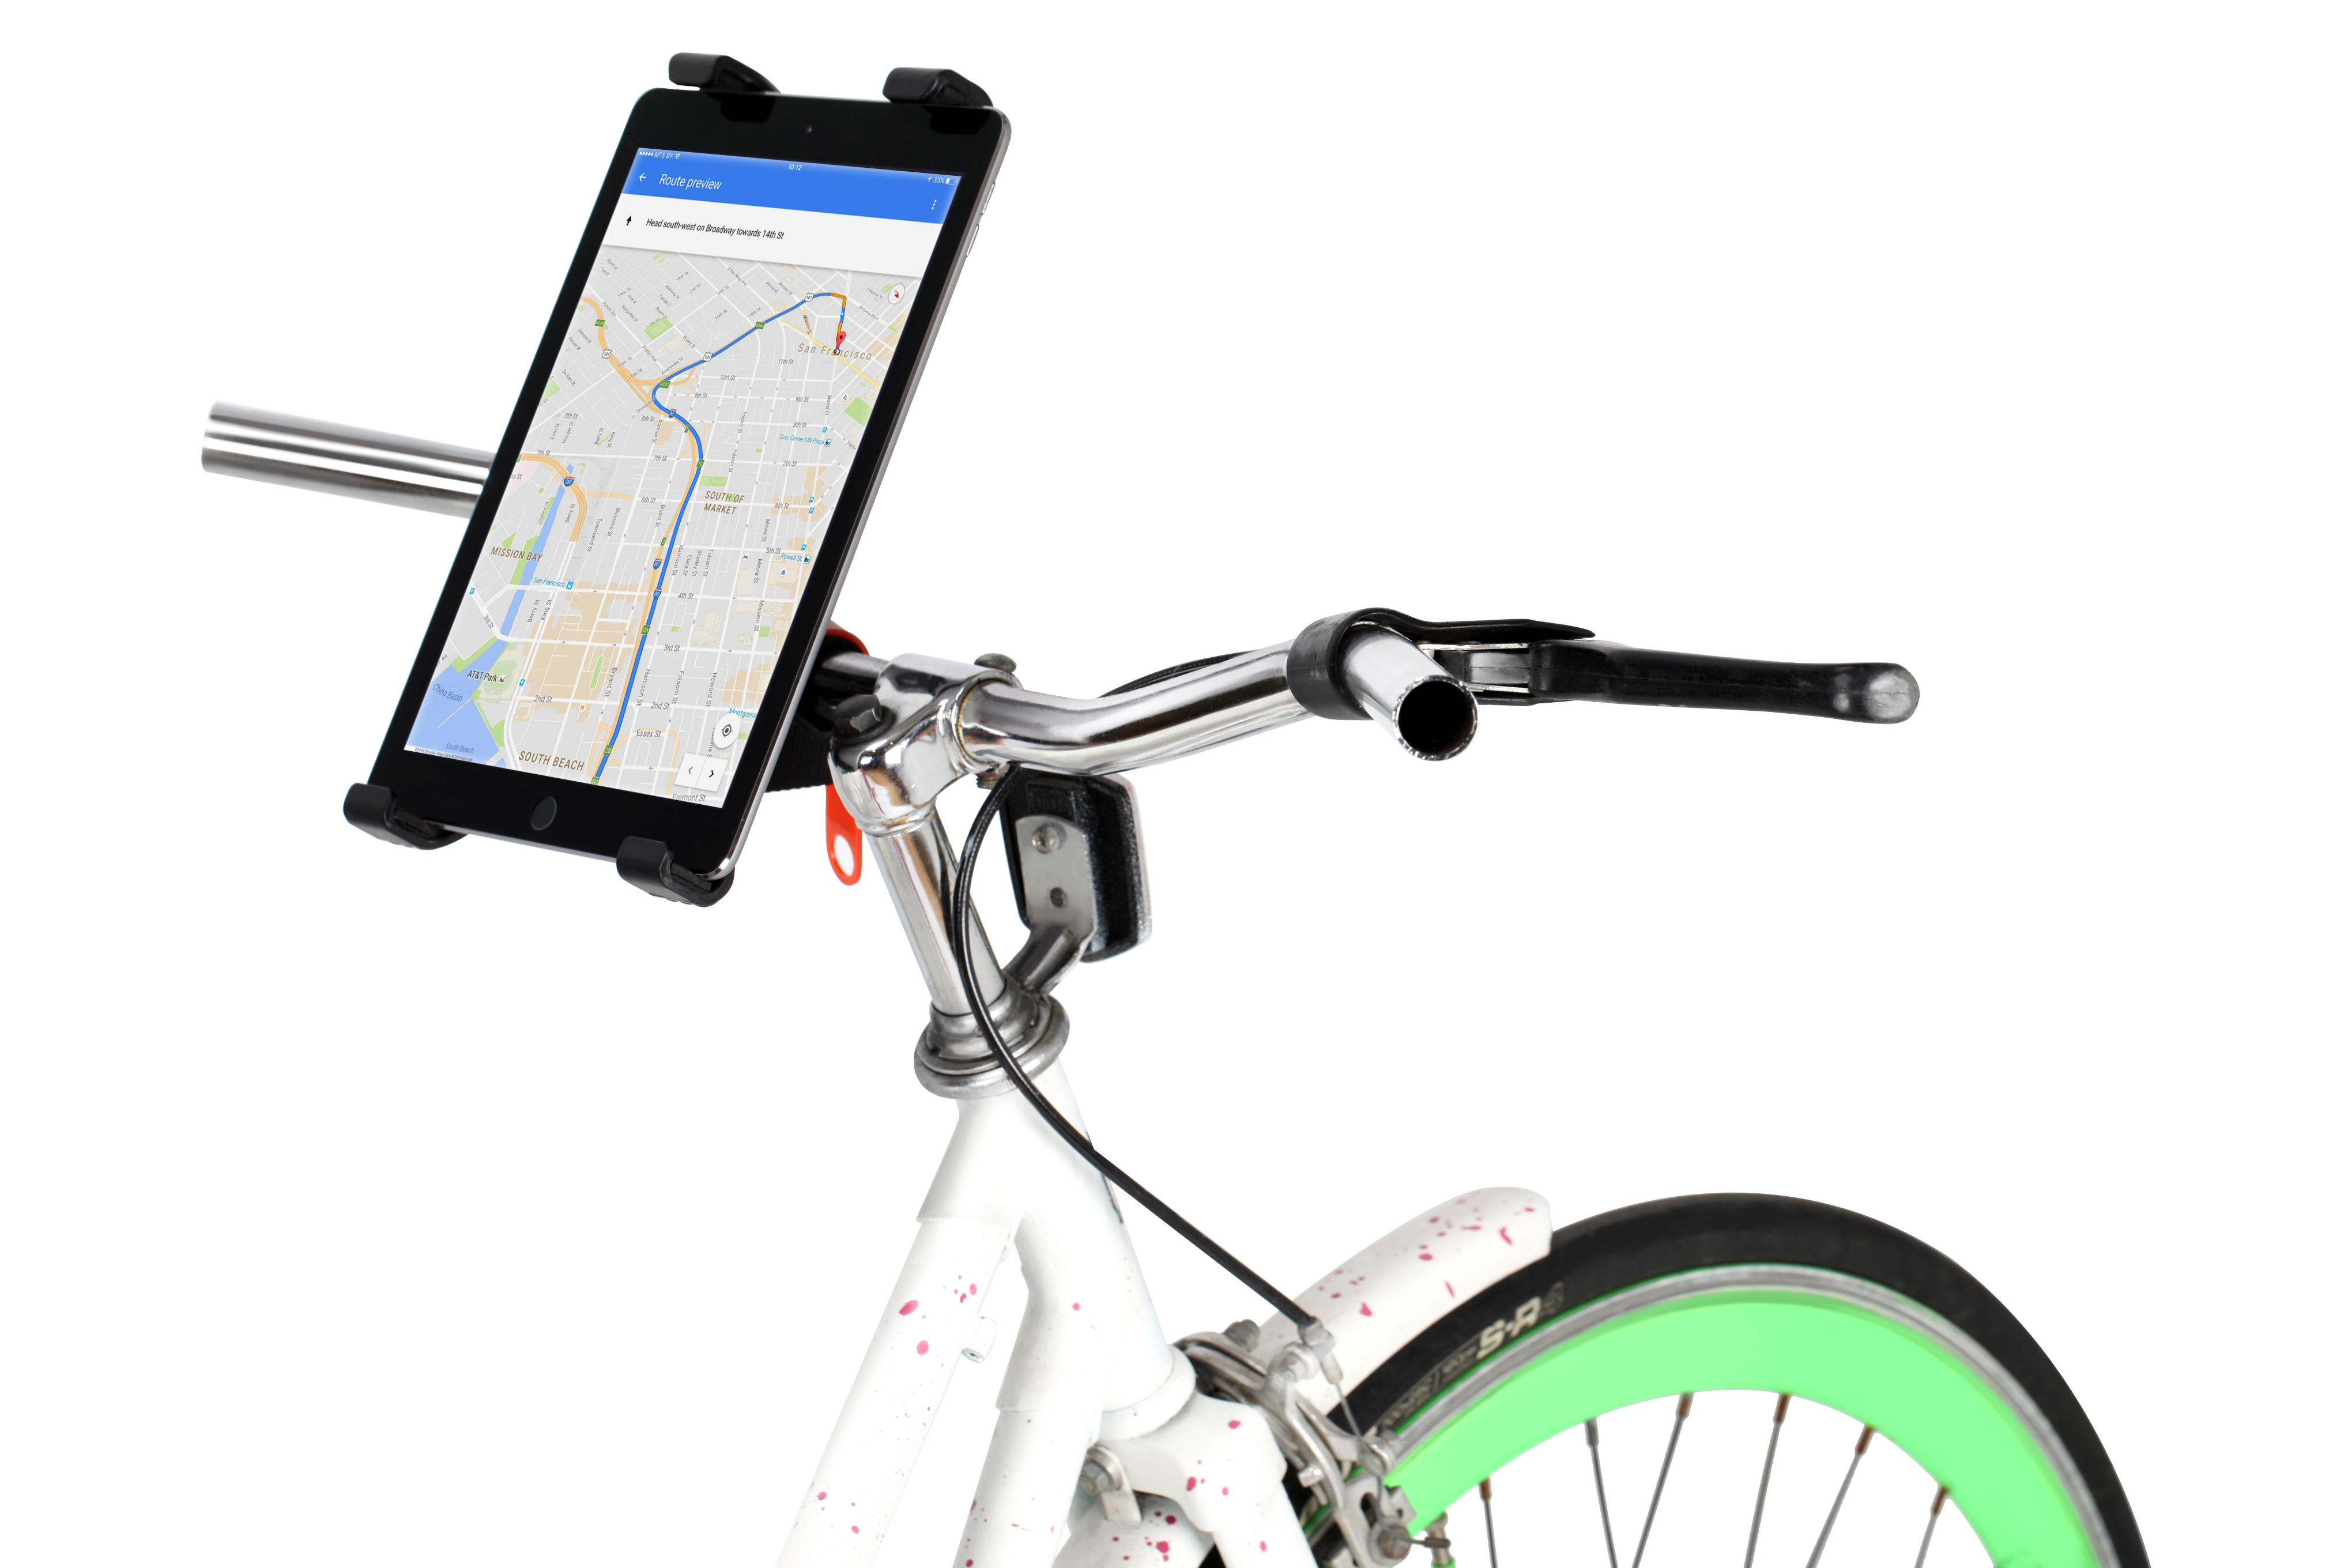 Lavolta Universal Tablet Ipad Holder Mount Stand Treadmill